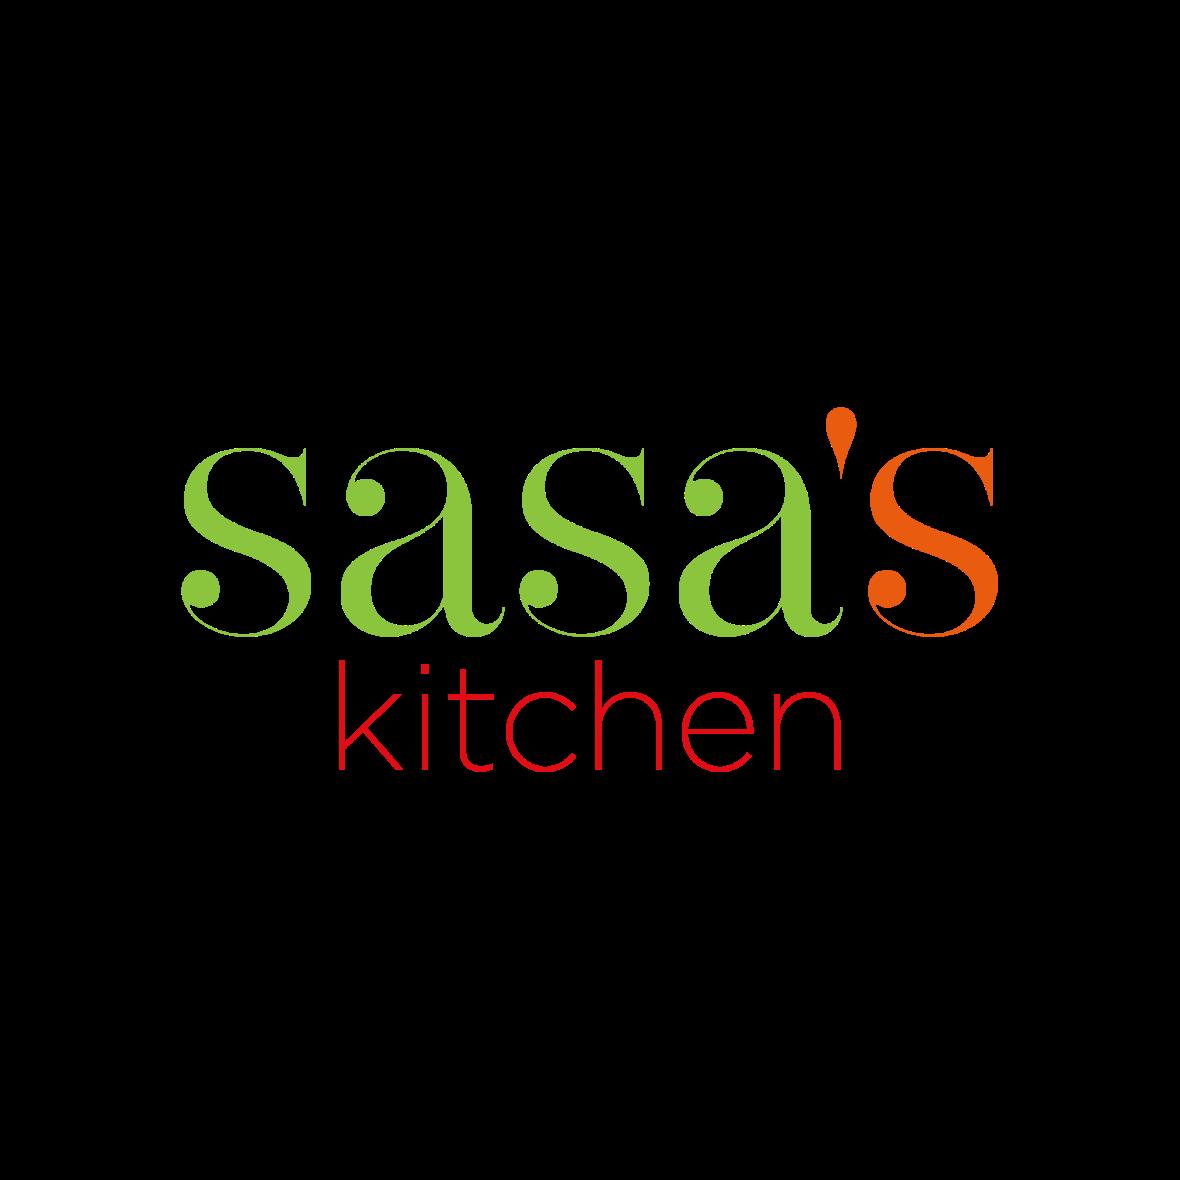 c4797_sasa_s_kitchen_logo_02-2